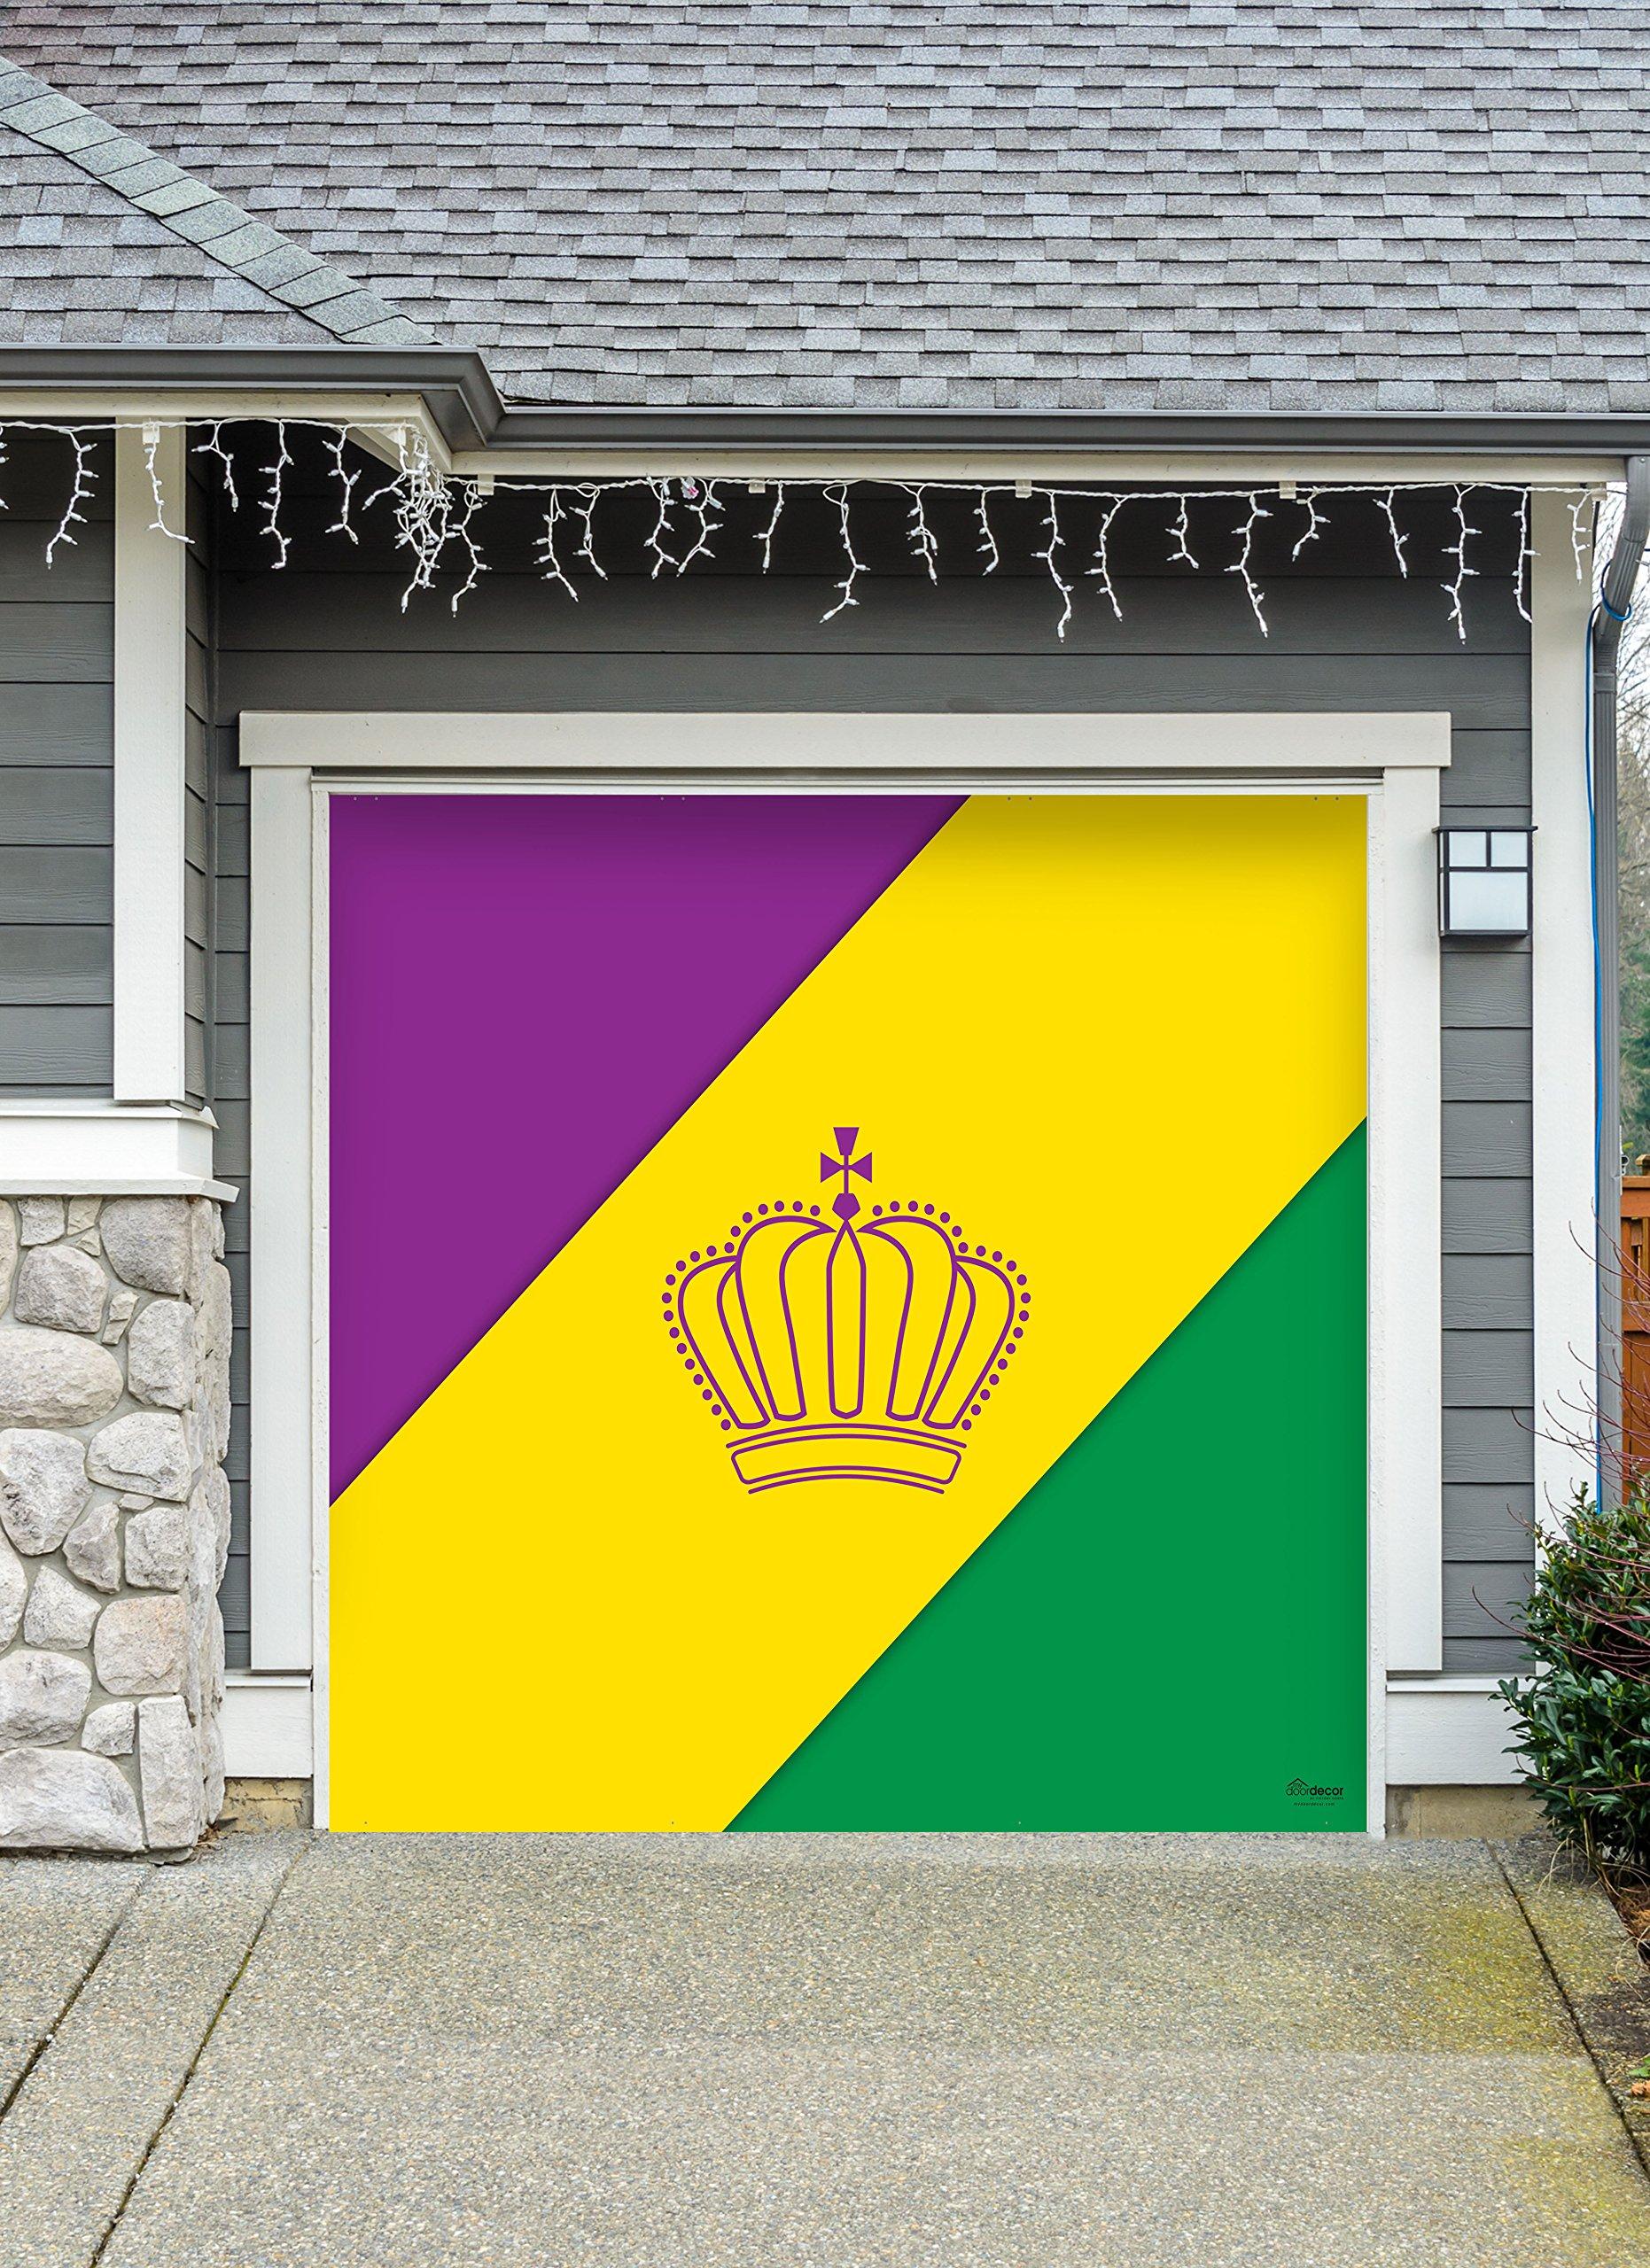 Outdoor Mardi Gras Decorations Garage Door Banner Cover Mural Décoration 8'x8' - Mardi Gras Diagonal Stripes - ''The Original Mardi Gras Supplies Holiday Garage Door Banner Decor''